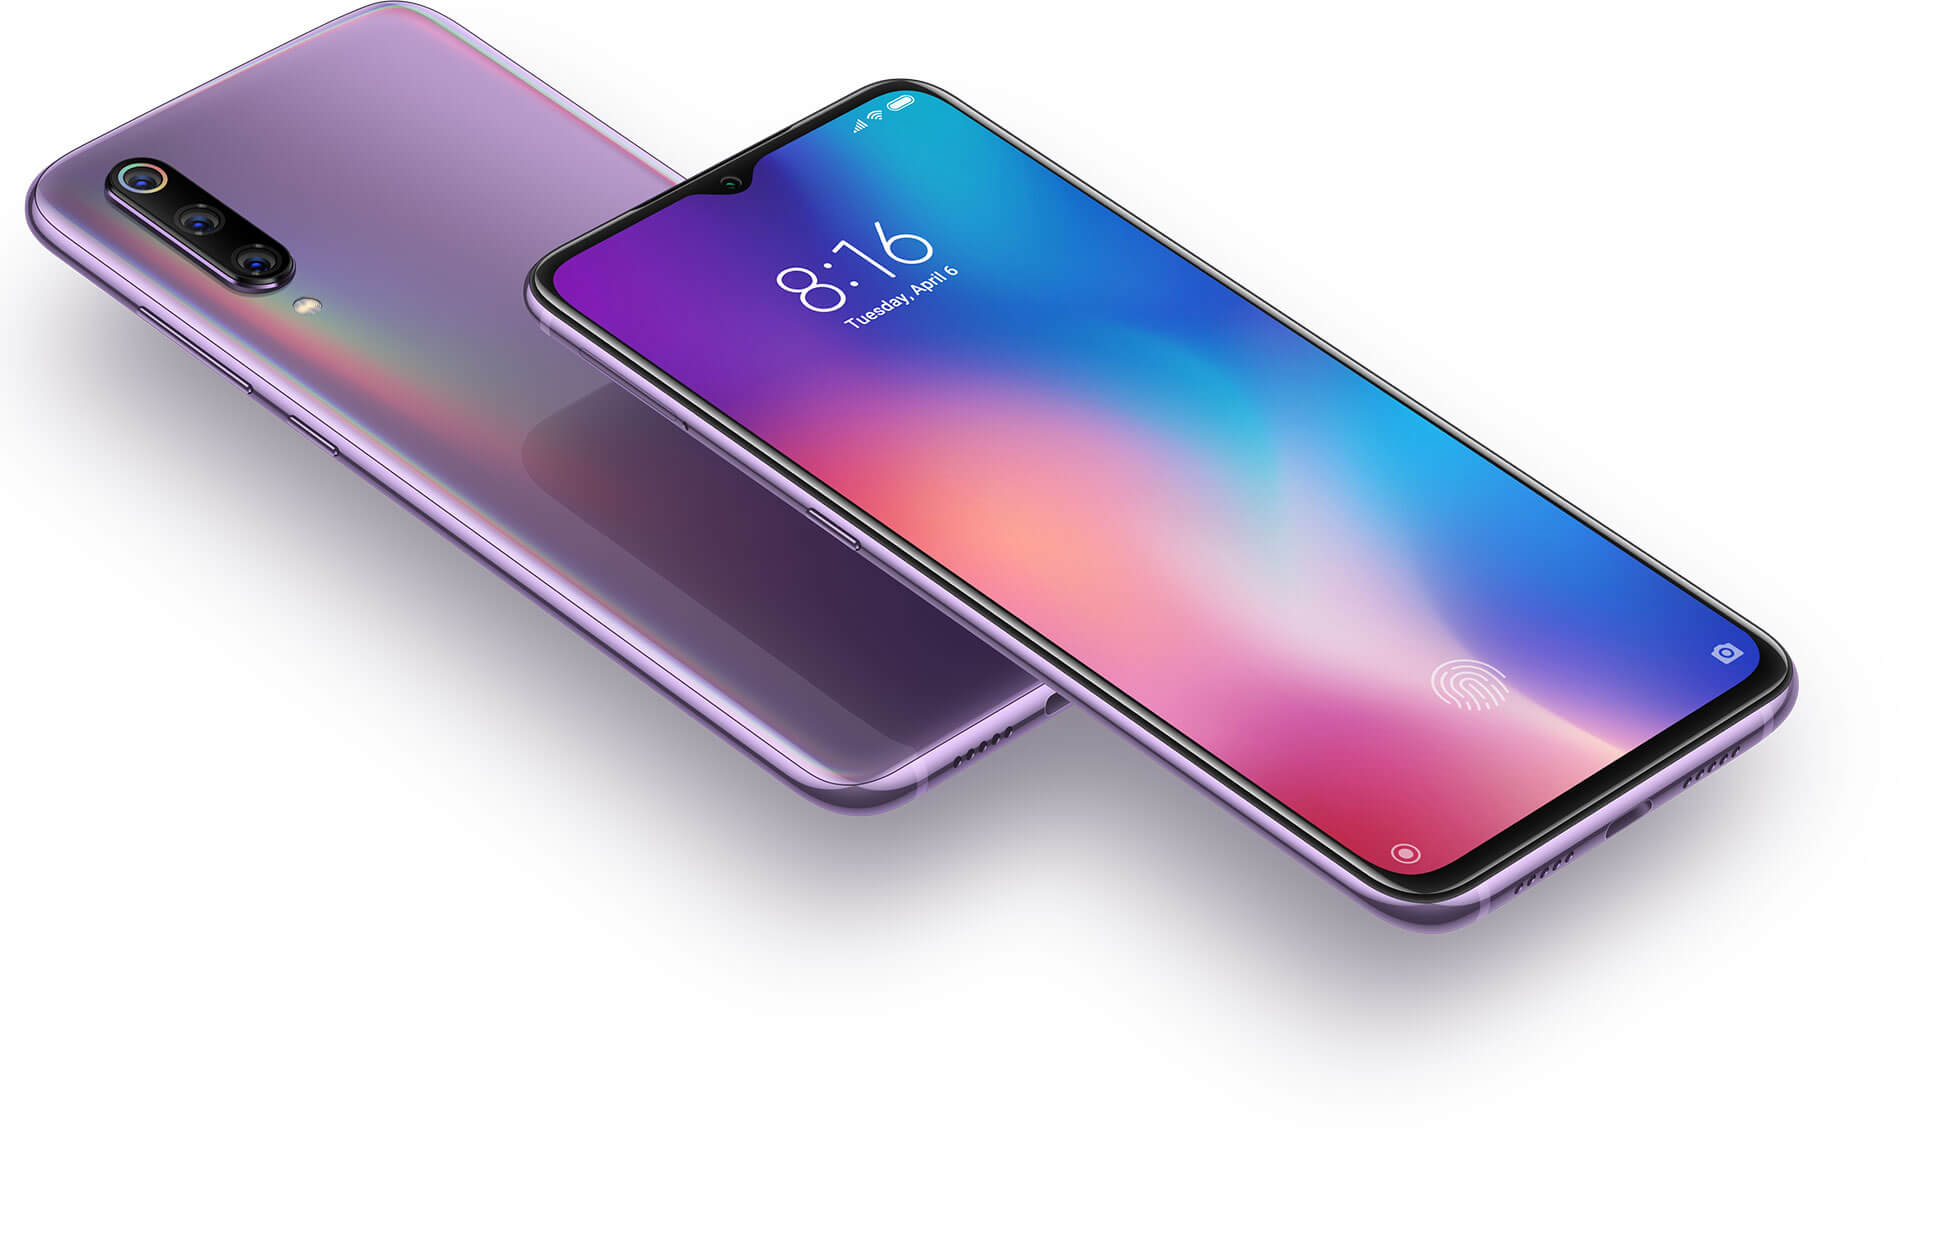 Xiaomi Mi 9 Review: The Best In Its Range 9